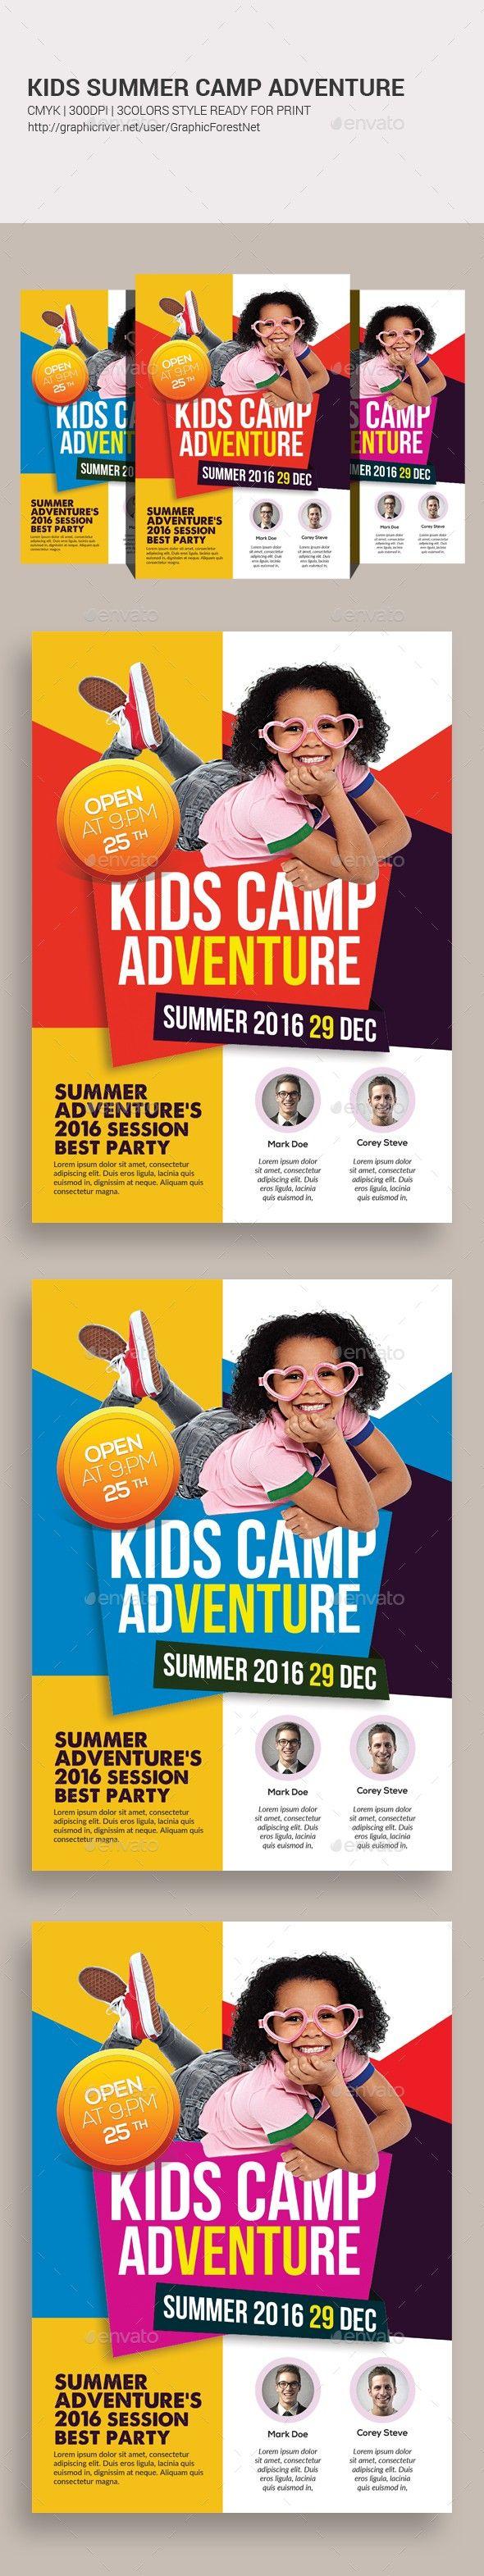 Activity Ad Adventure Advert Advertisement Boys Camp Child Children Class Community Da Summer Camps For Kids Summer Kids Family Activities Preschool